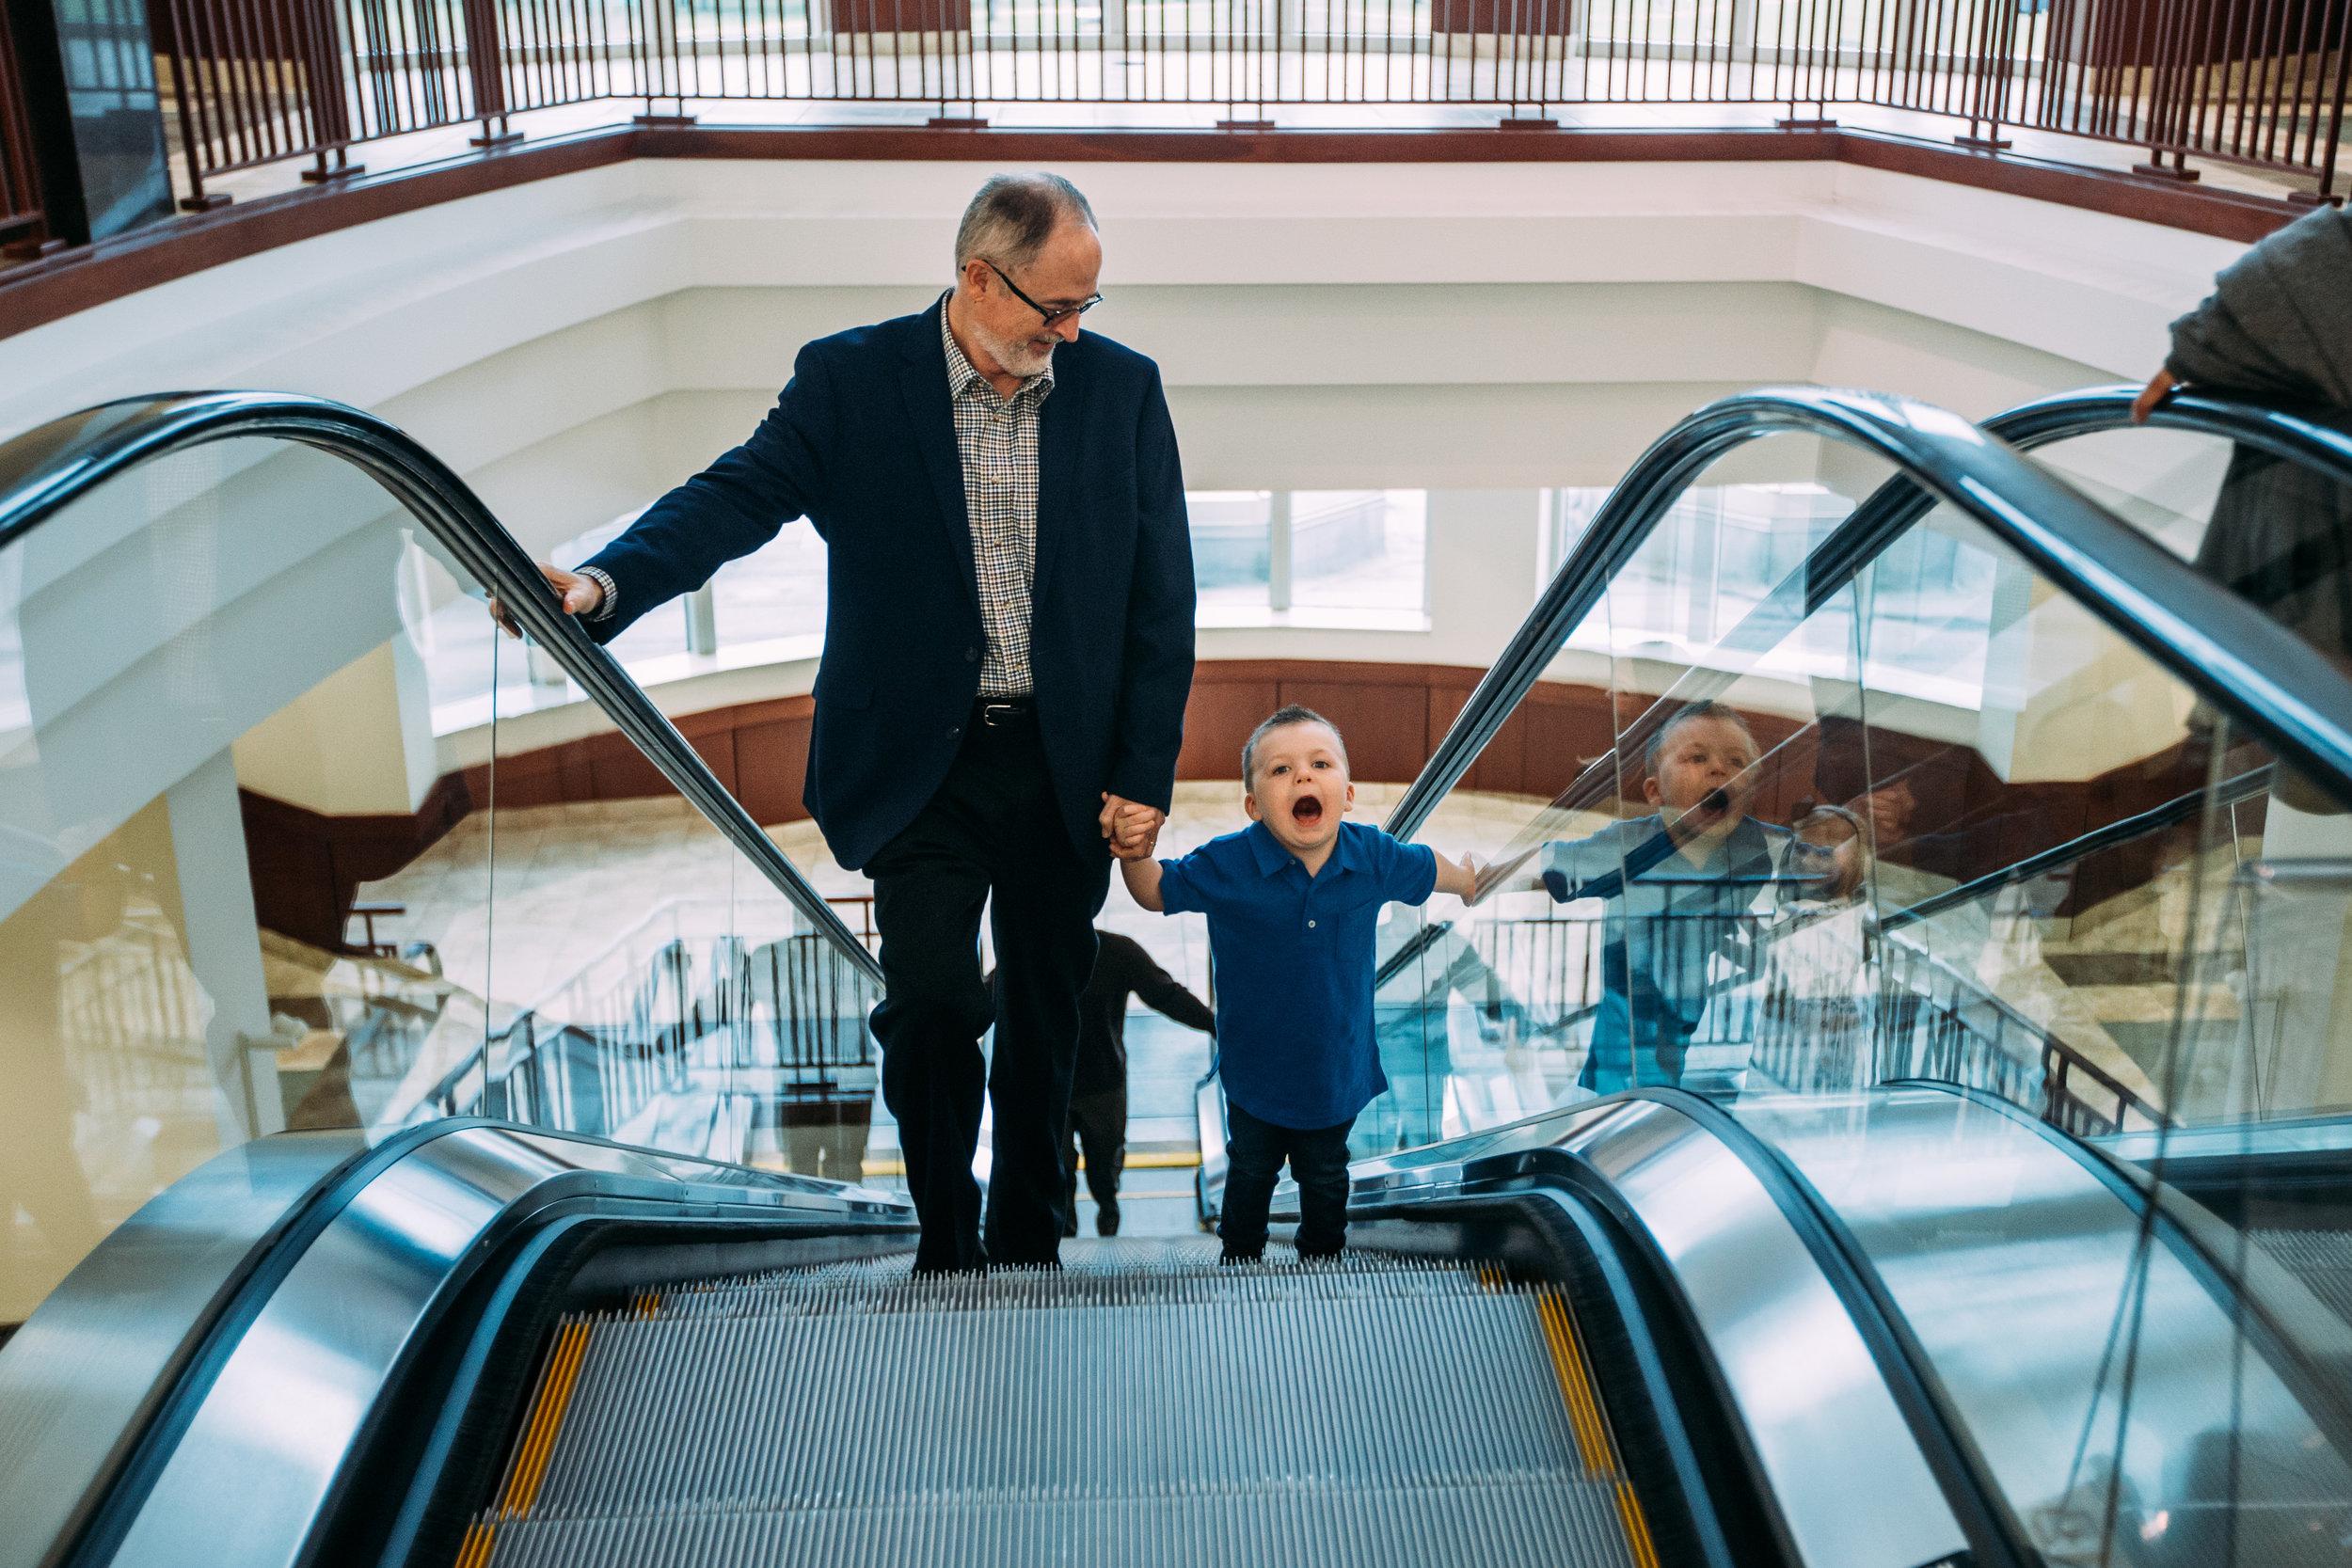 Documentary Family Photographer in Houston - Martin Adoption-0409.jpg